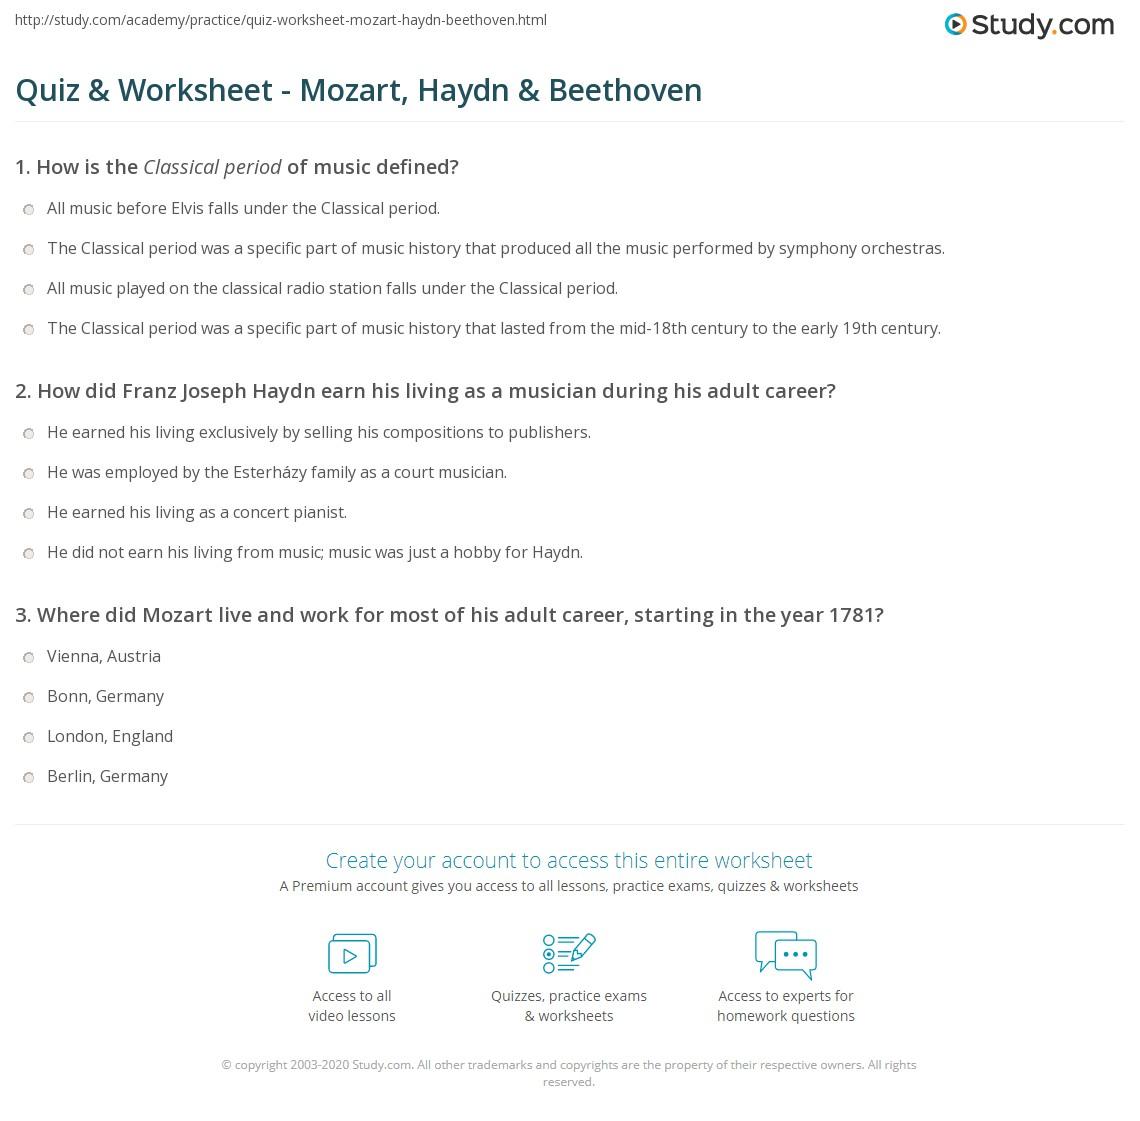 Quiz & Worksheet - Mozart, Haydn & Beethoven | Study.com